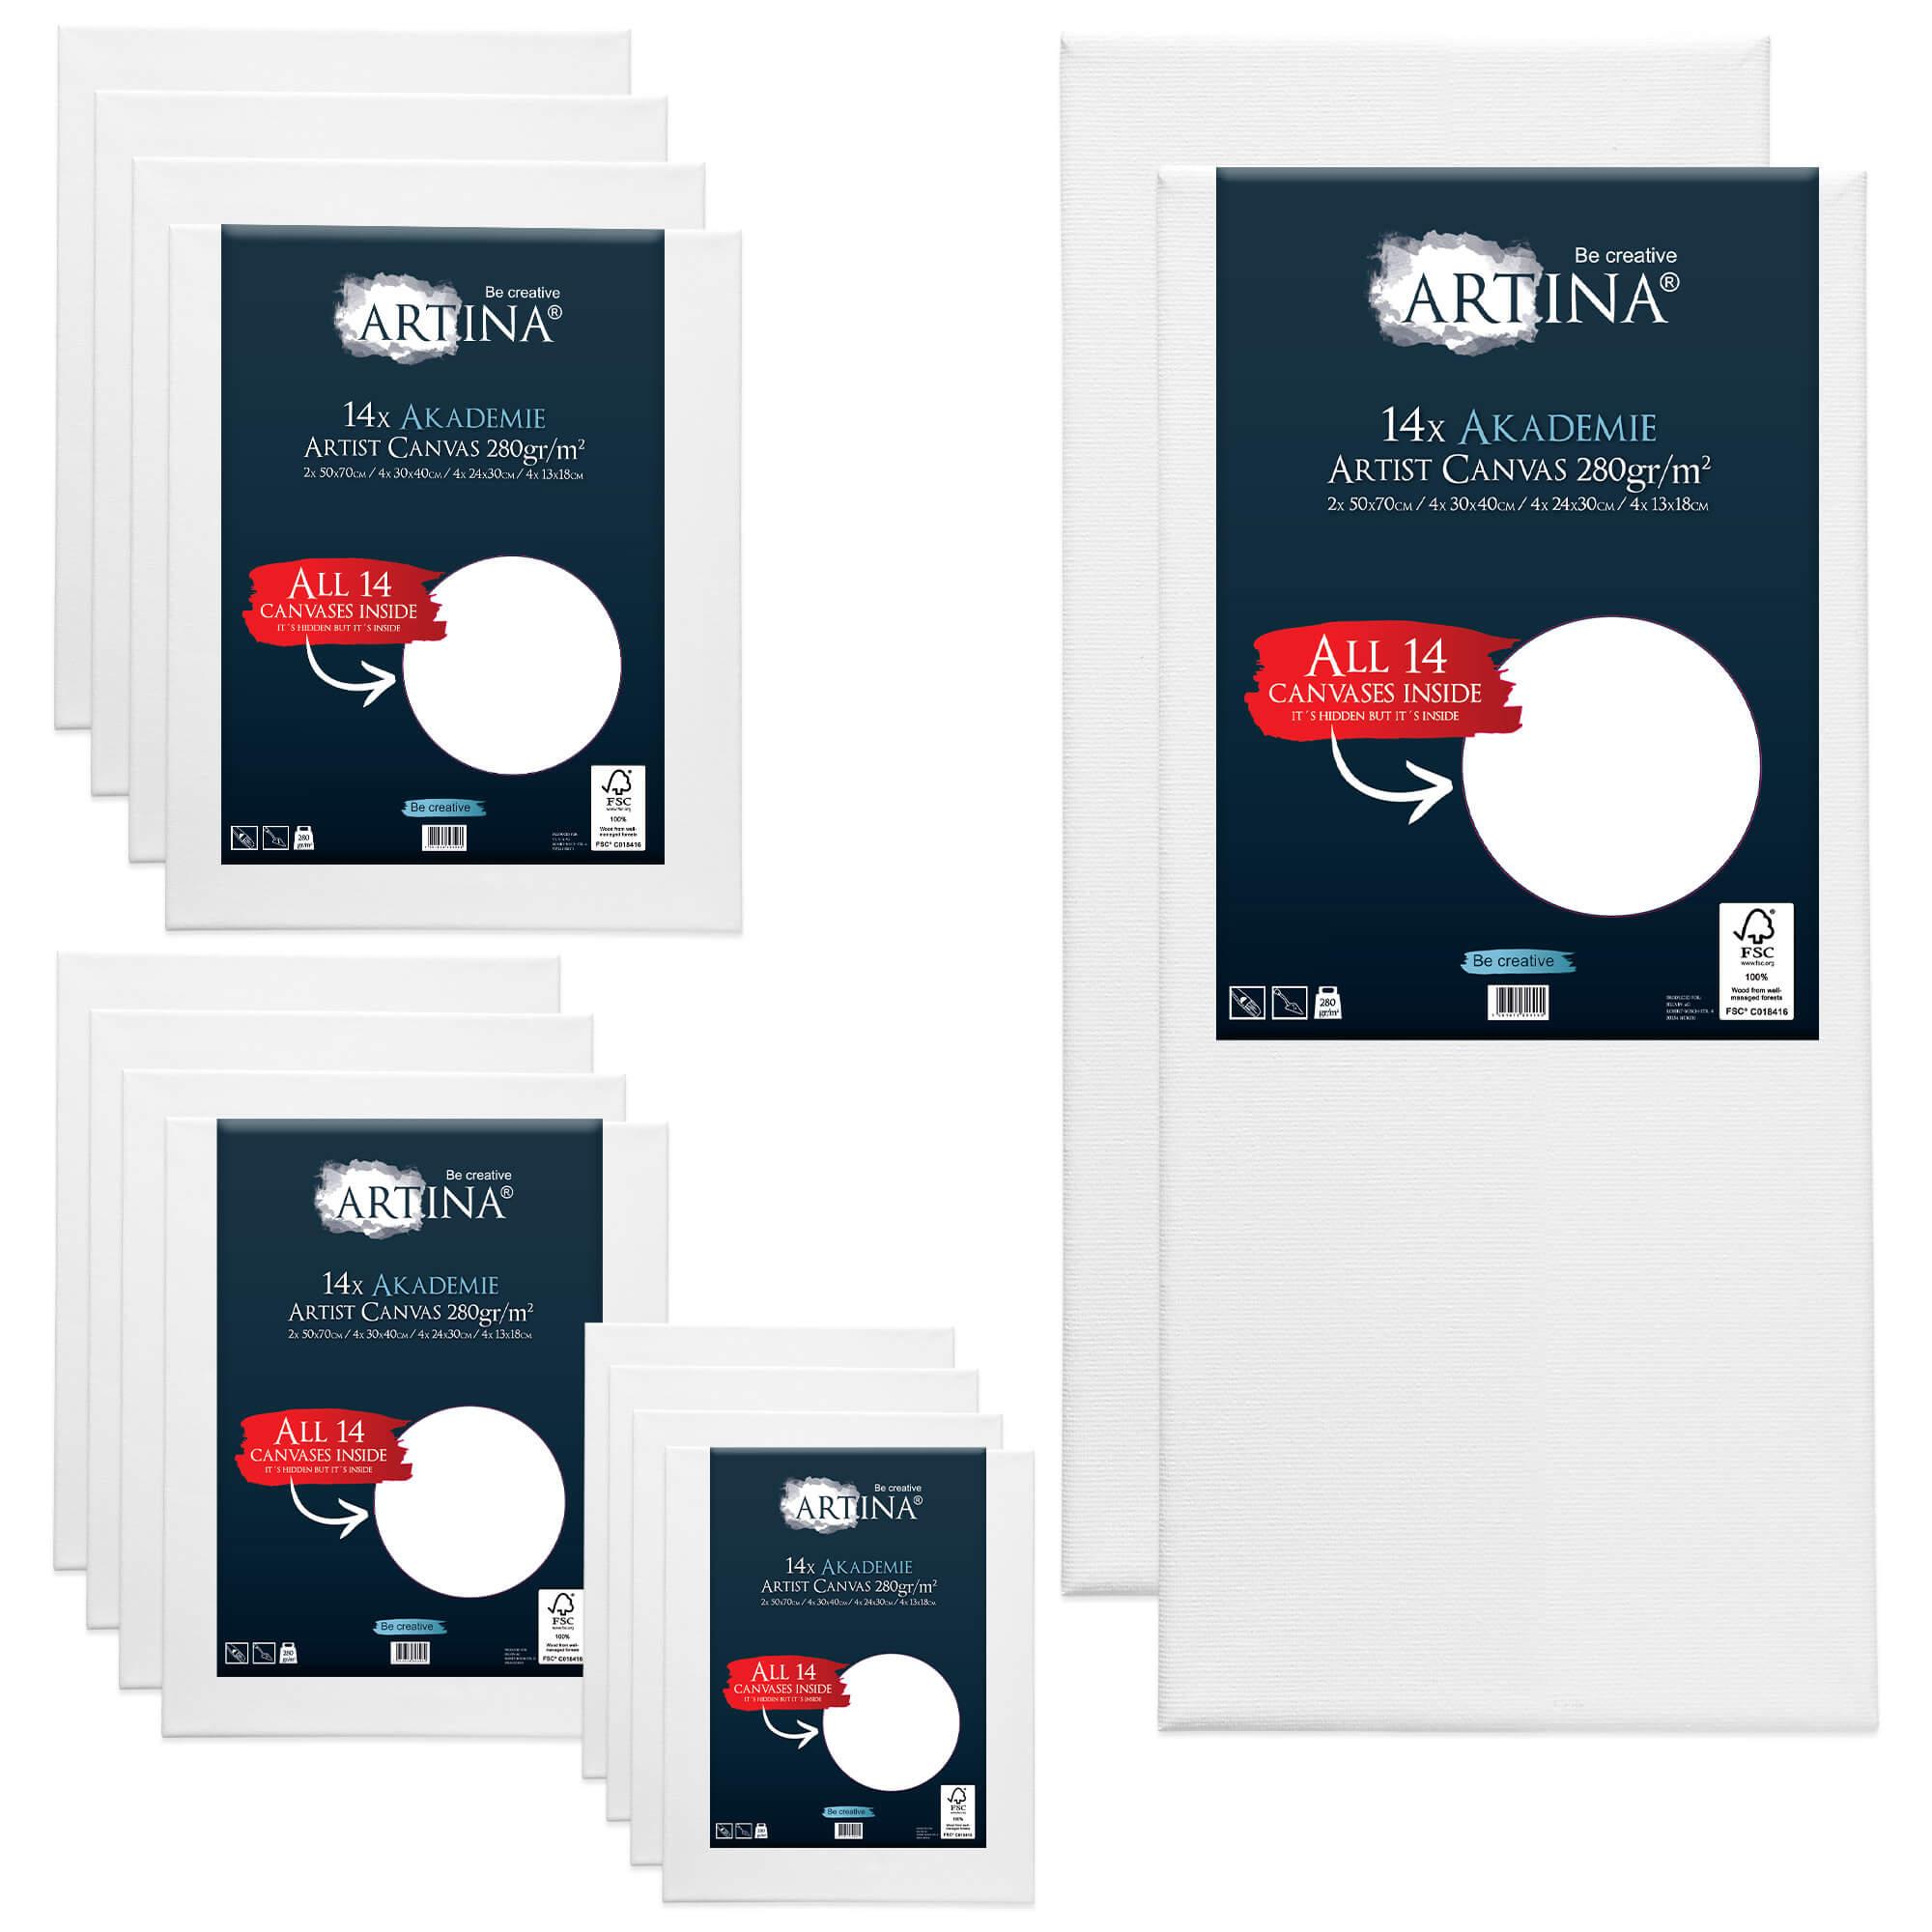 14er Keilrahmen Set Artina mit FSC®-Zertifizierung